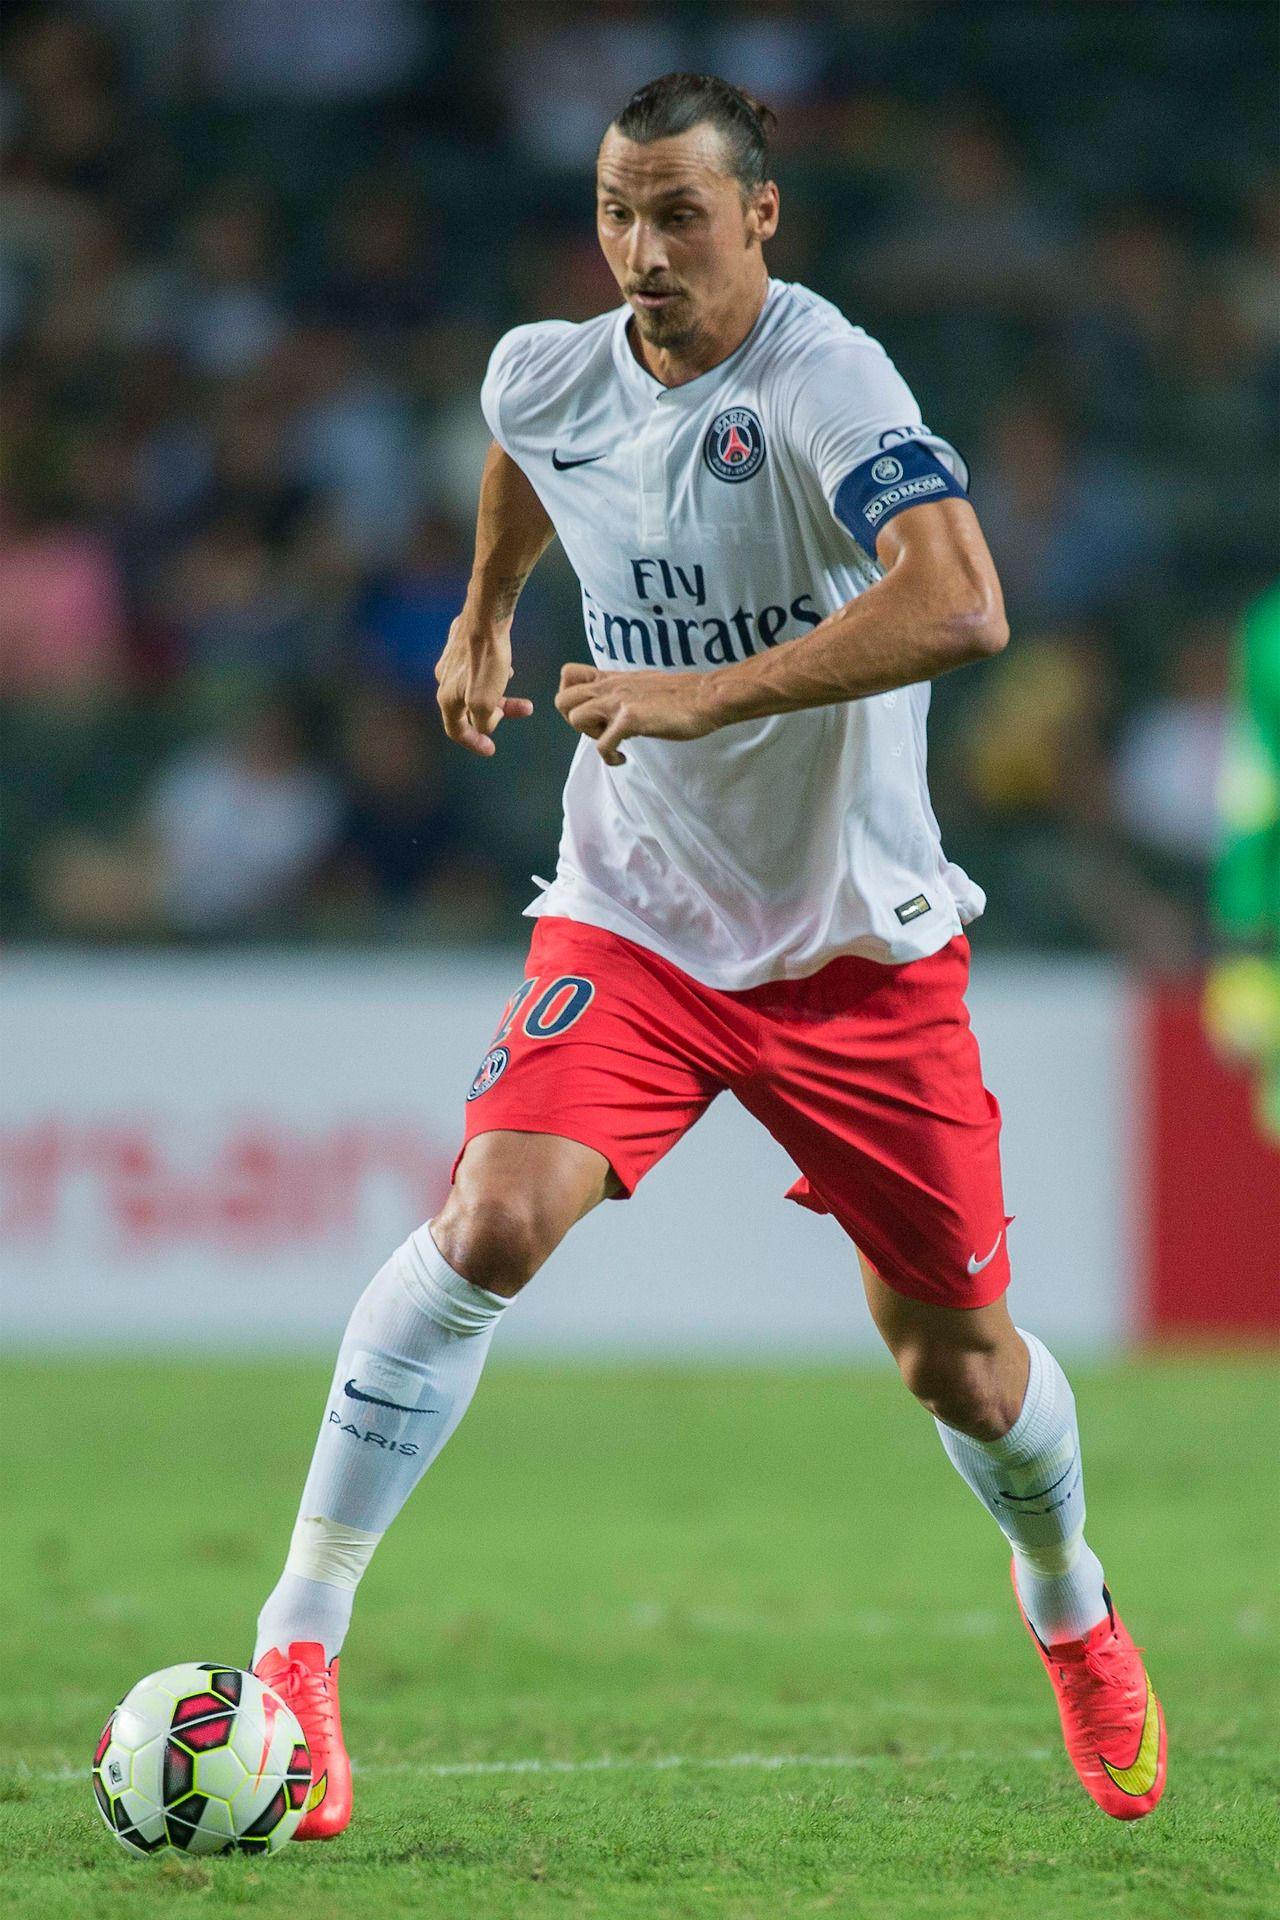 Zlatan Ibrahimovic Psg Futebol Masculino Fotografia De Futebol Futebol